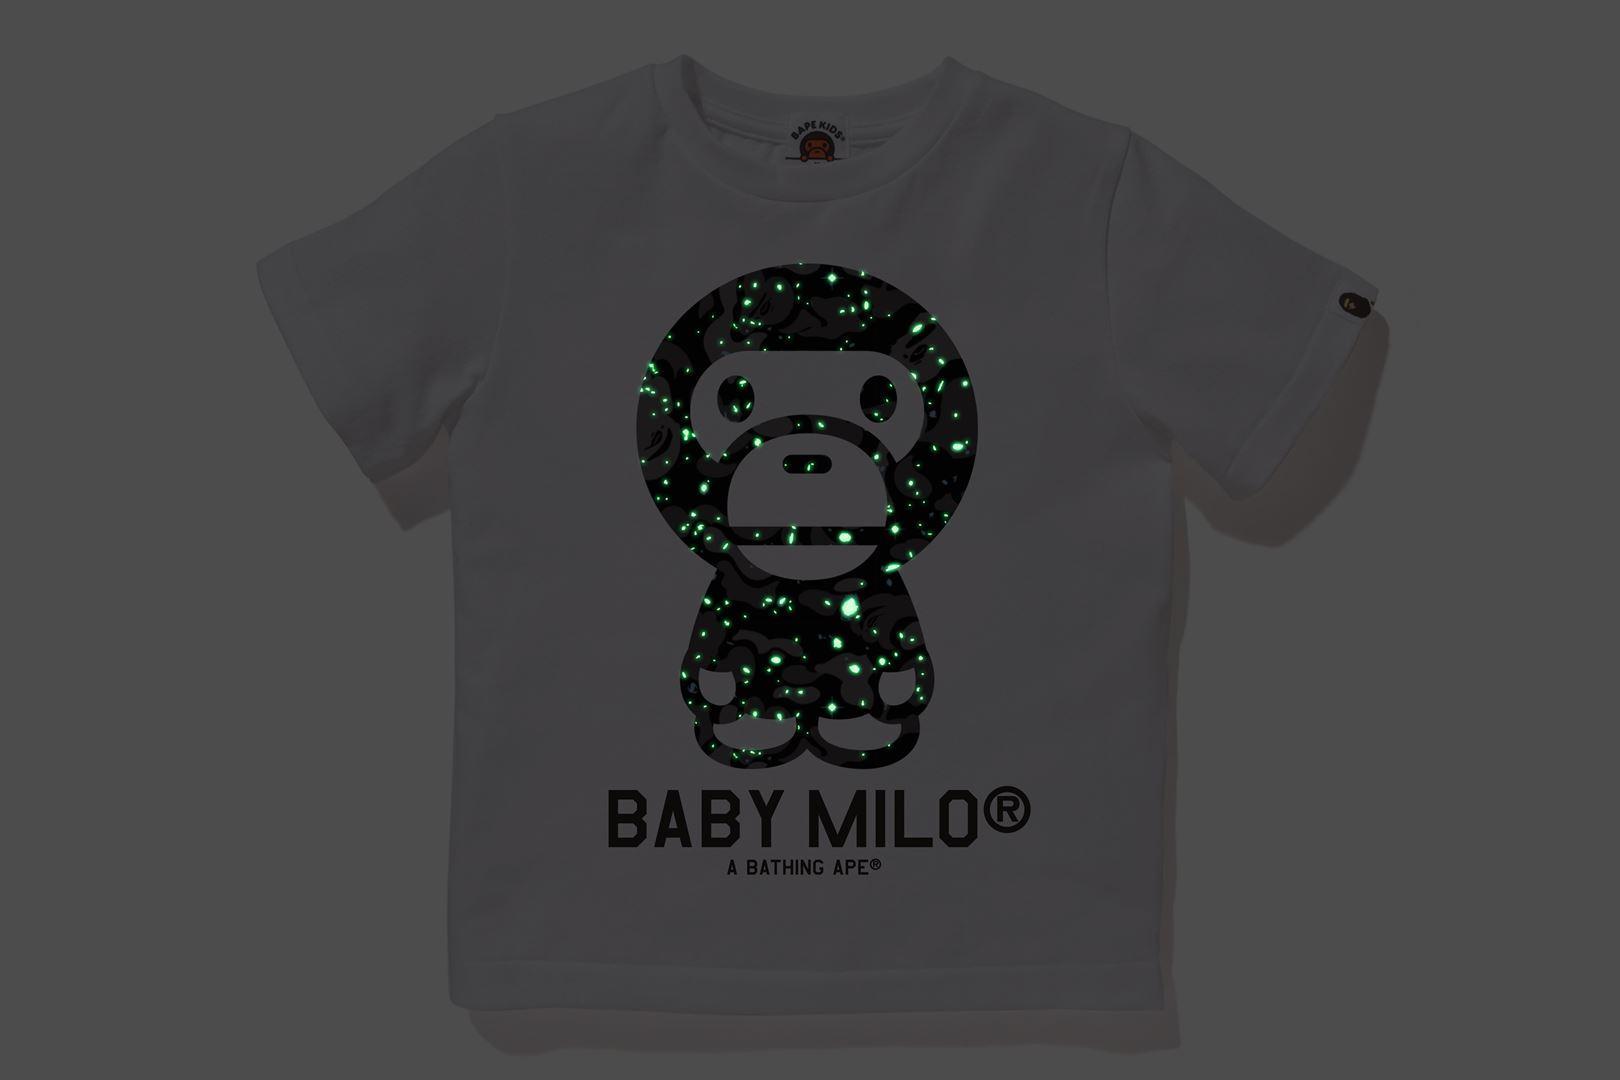 SPACE CAMO BABY MILO® TEE_a0174495_17403151.jpg